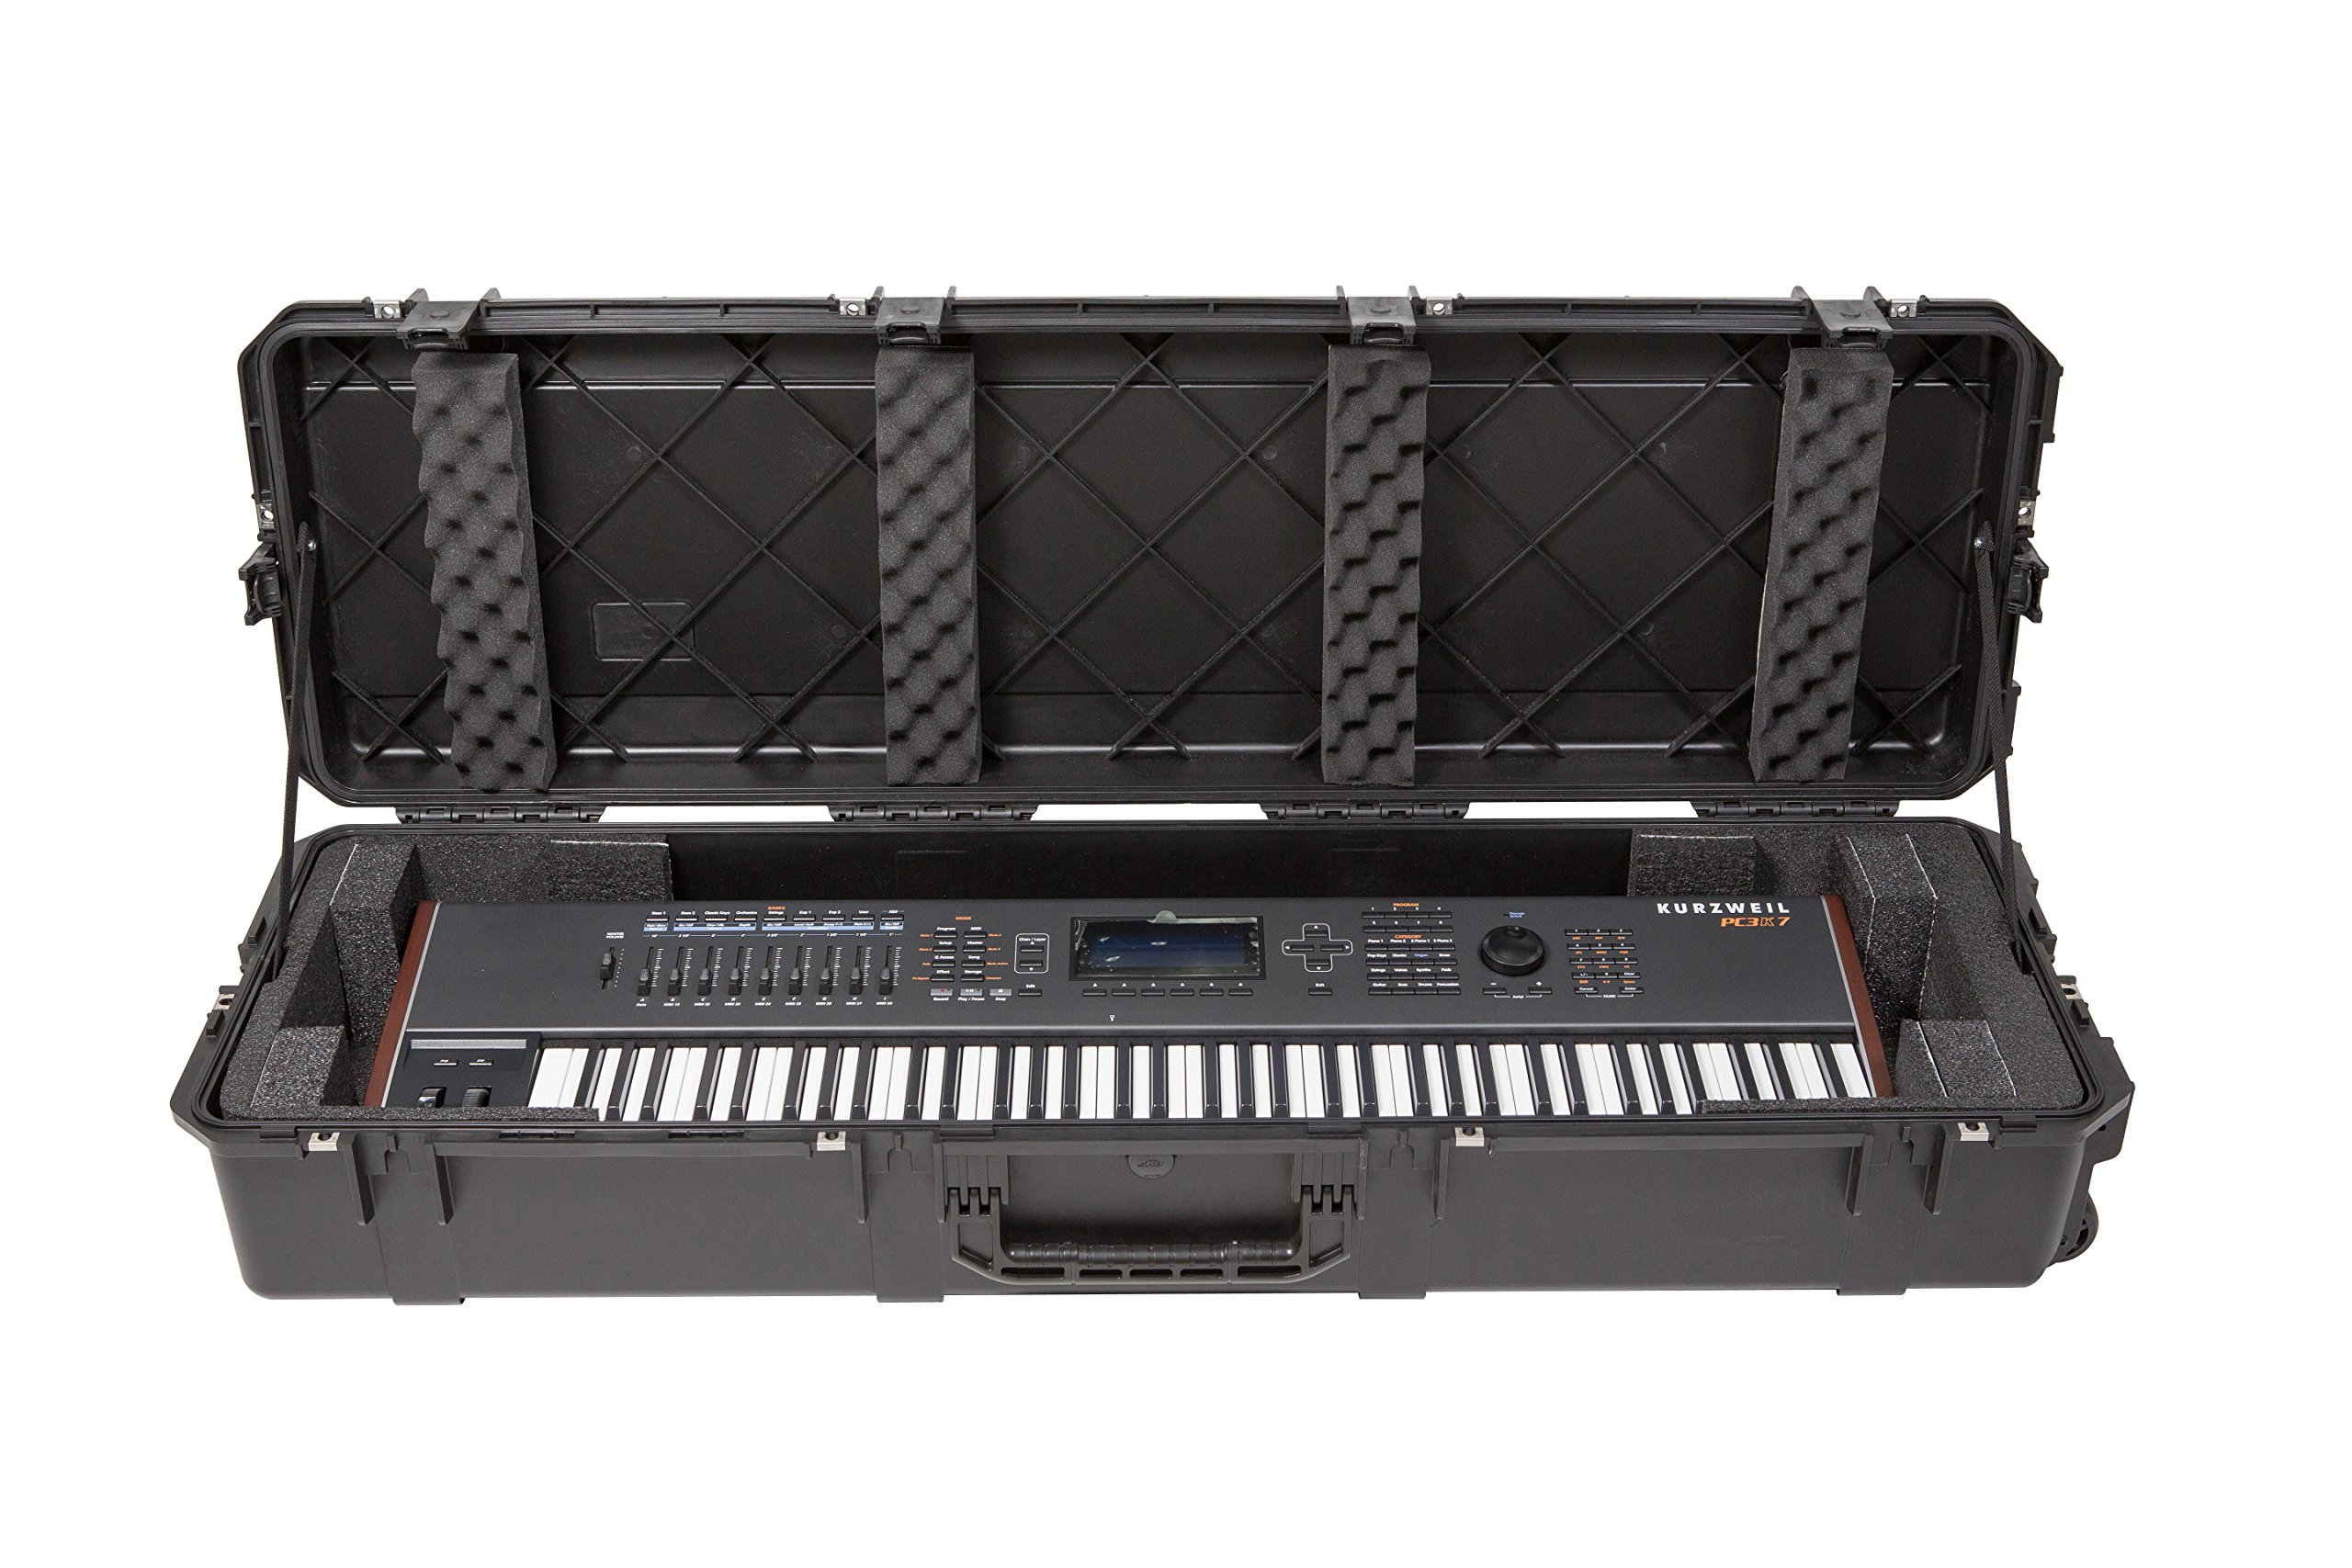 SKB 3i-5616-KBD Piano or Keyboard Case, Black